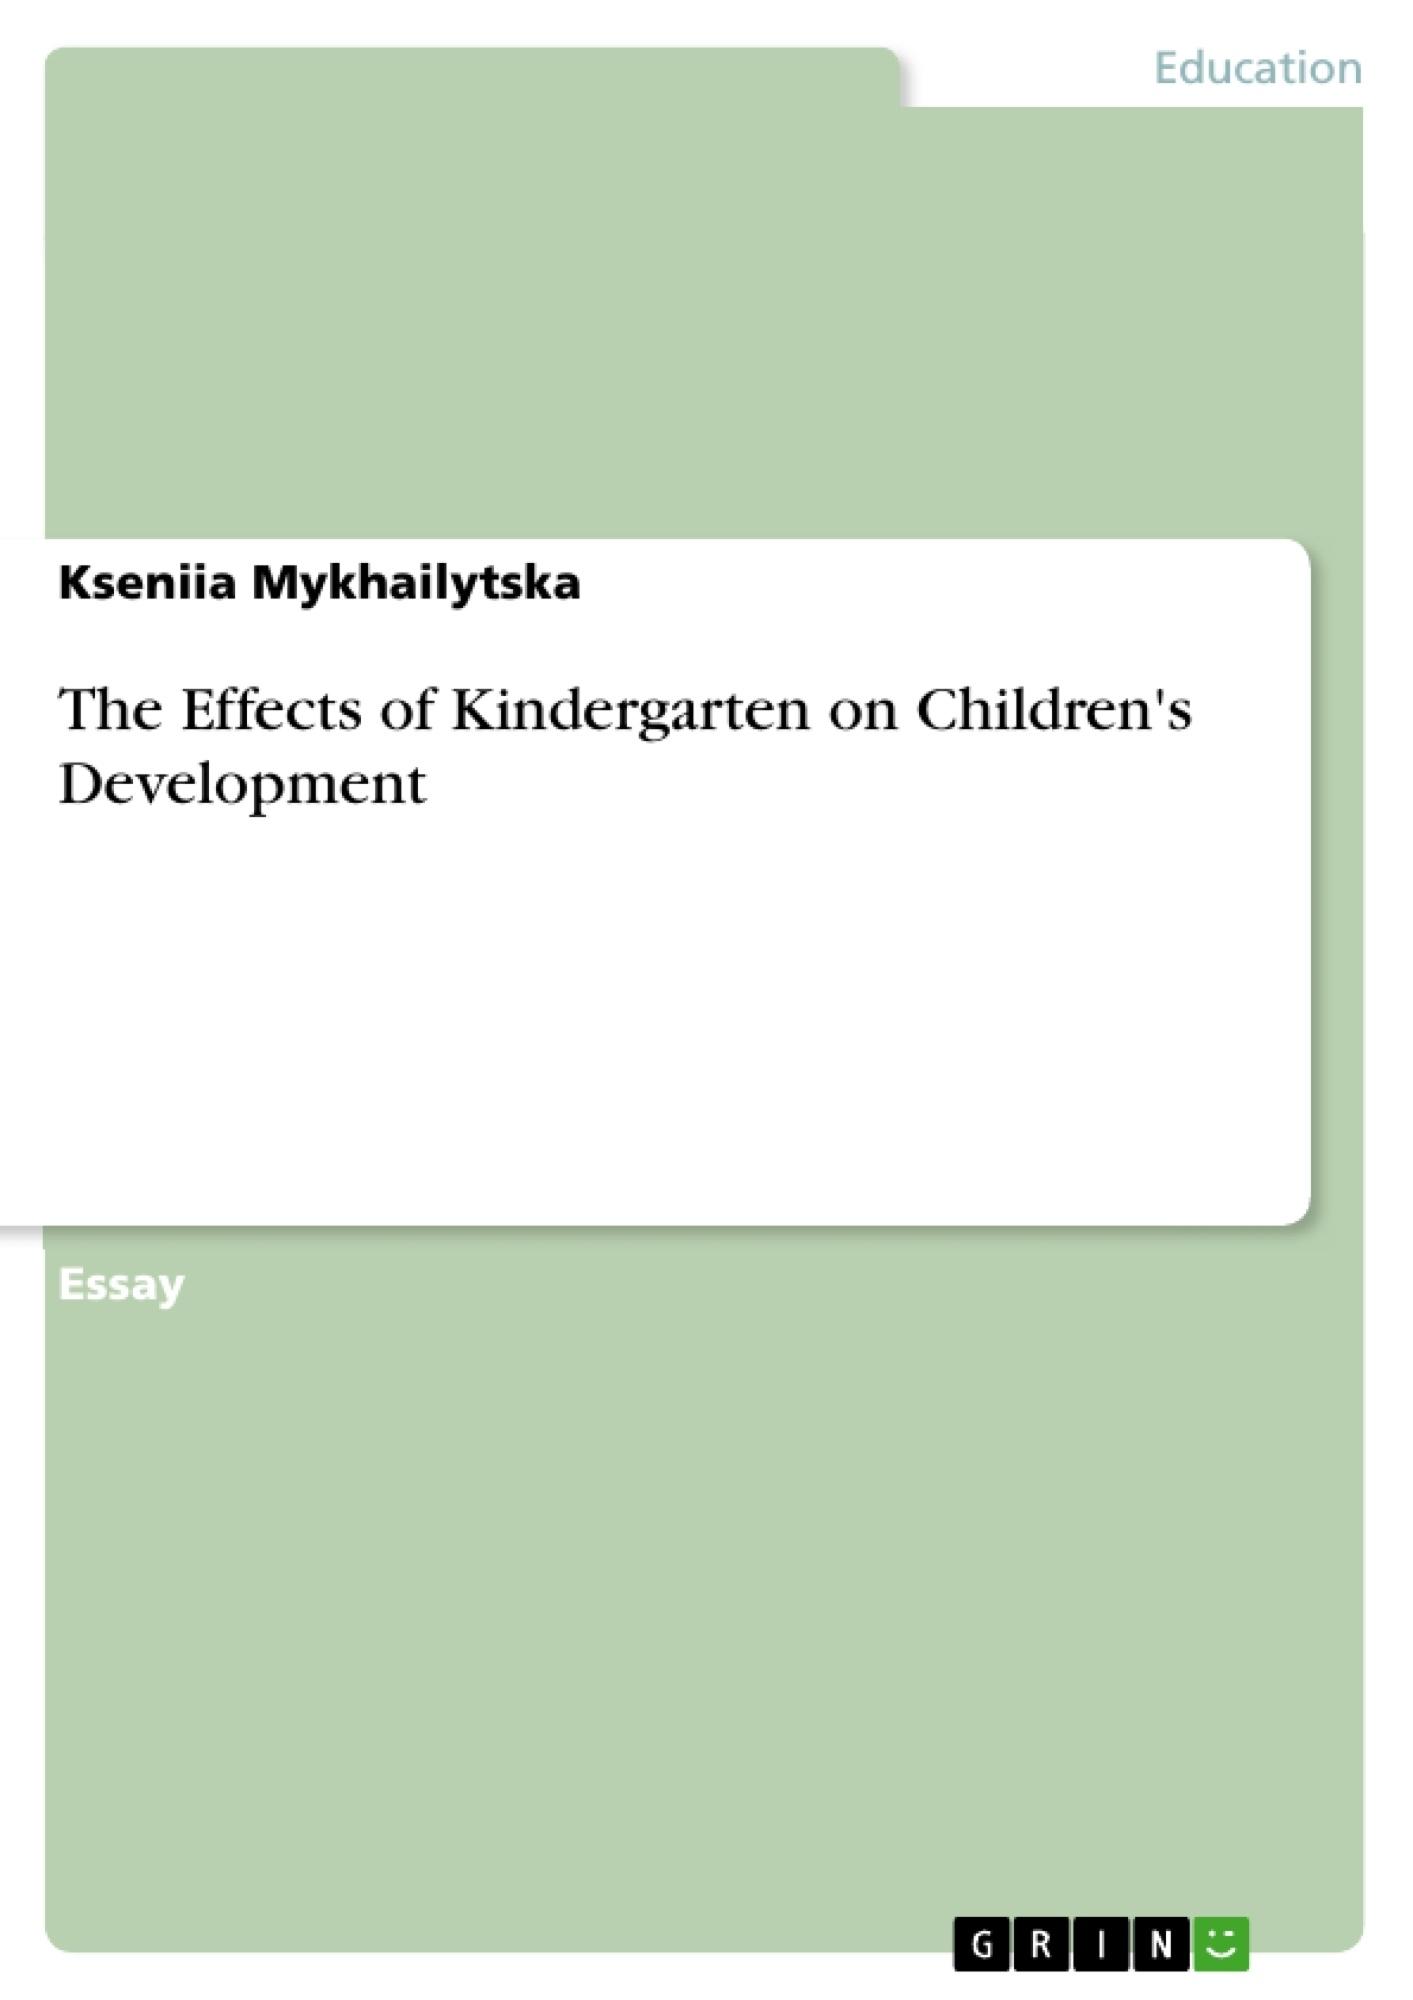 Title: The Effects of Kindergarten on Children's Development